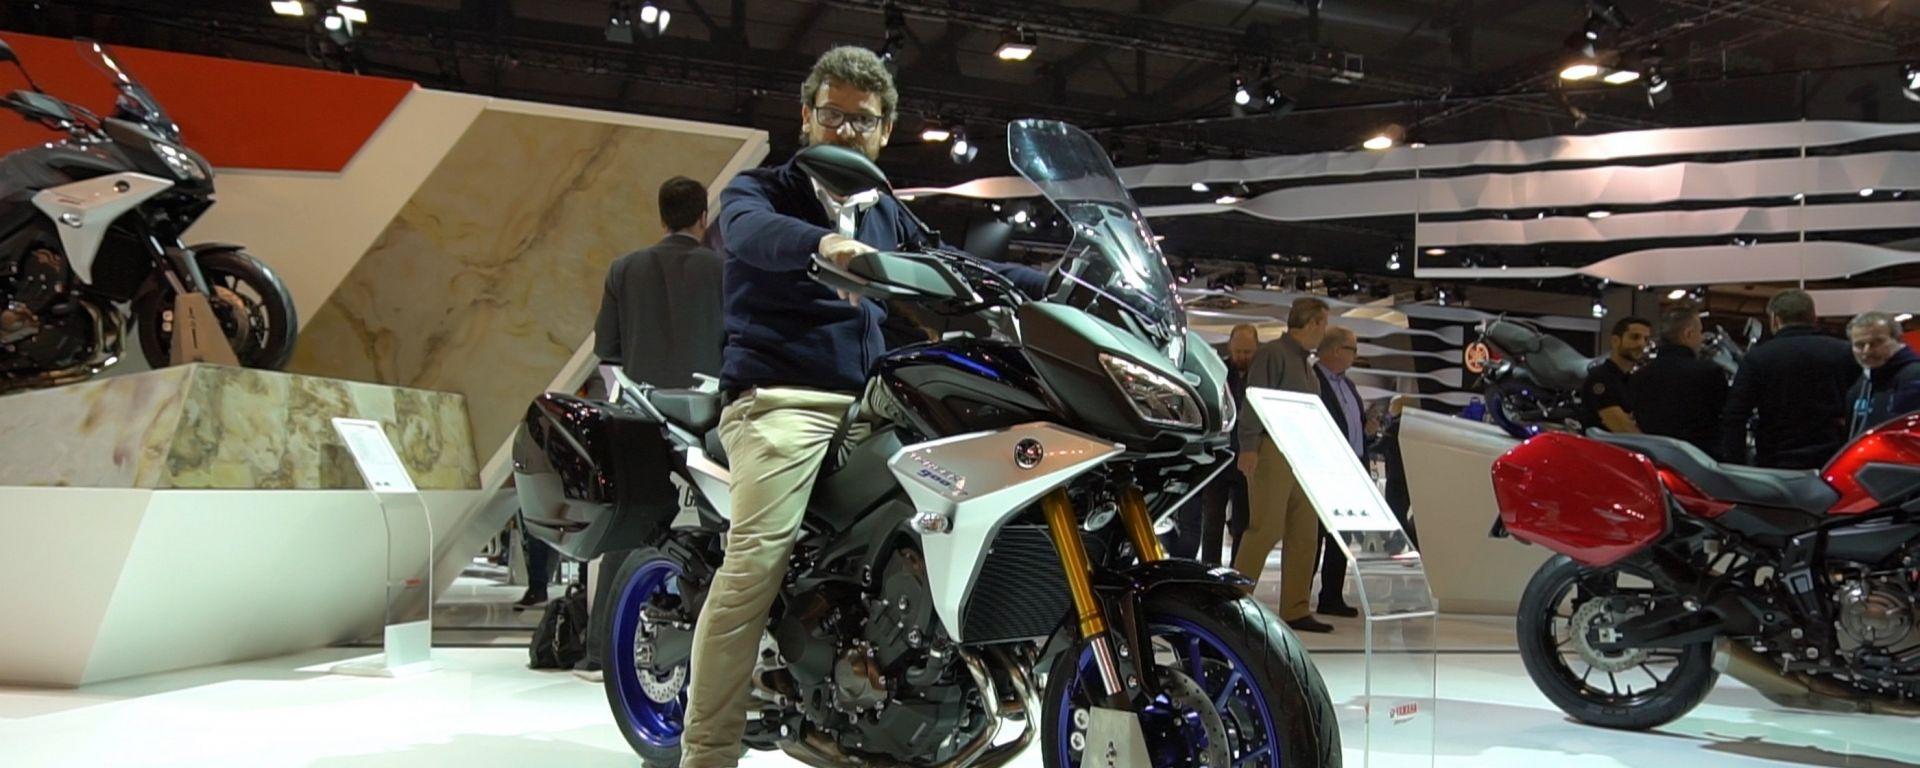 Yamaha Tracer 900 M.Y. 2018: tutta nuova per EICMA 2017 [VIDEO]